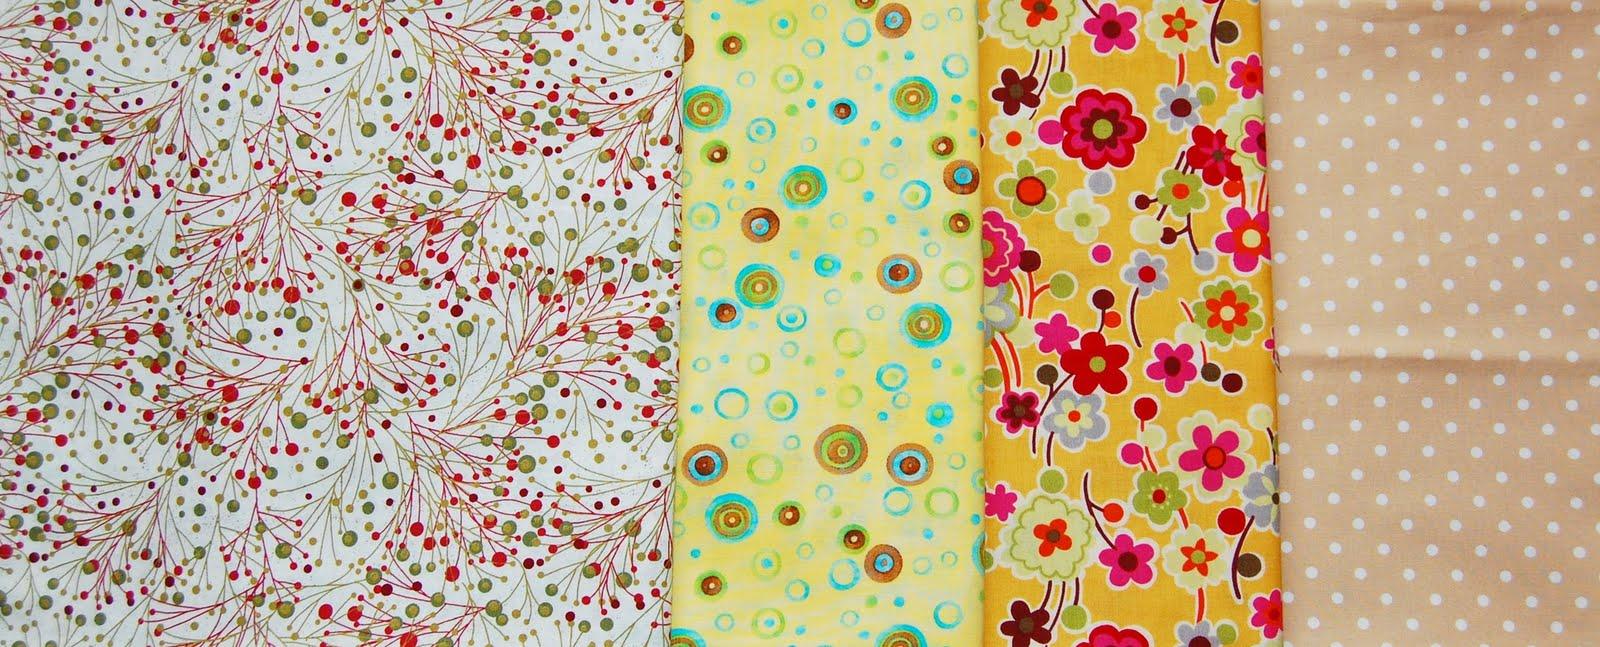 Mybotang fabric scrap series cards - Fabric From Left Moda Clothworks Moda Cotton